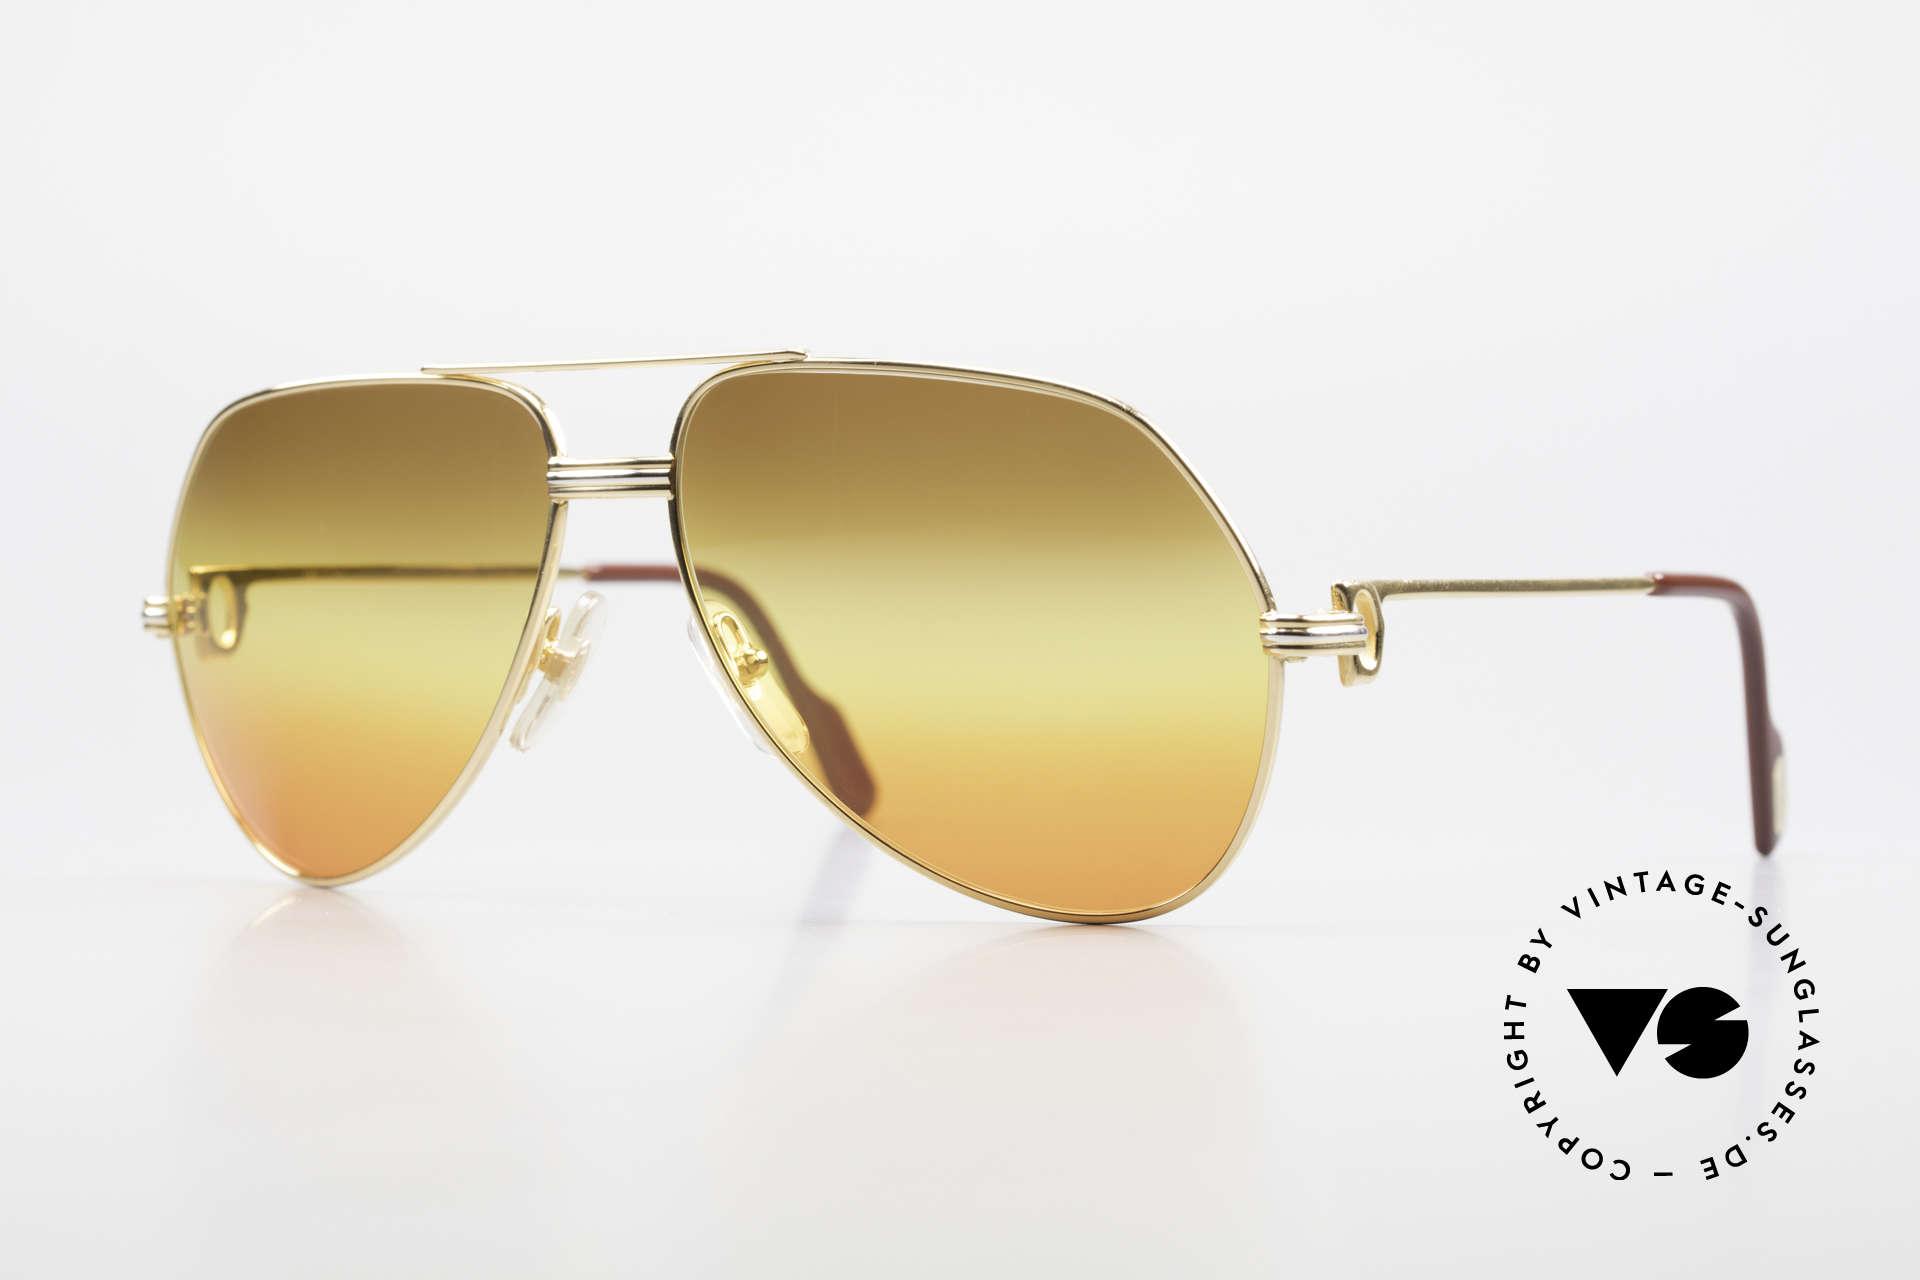 Cartier Vendome LC - M TRIPLE GRADIENT DESERT SUN, vintage CARTIER aviator sunglasses, model VENDOME, Made for Men and Women